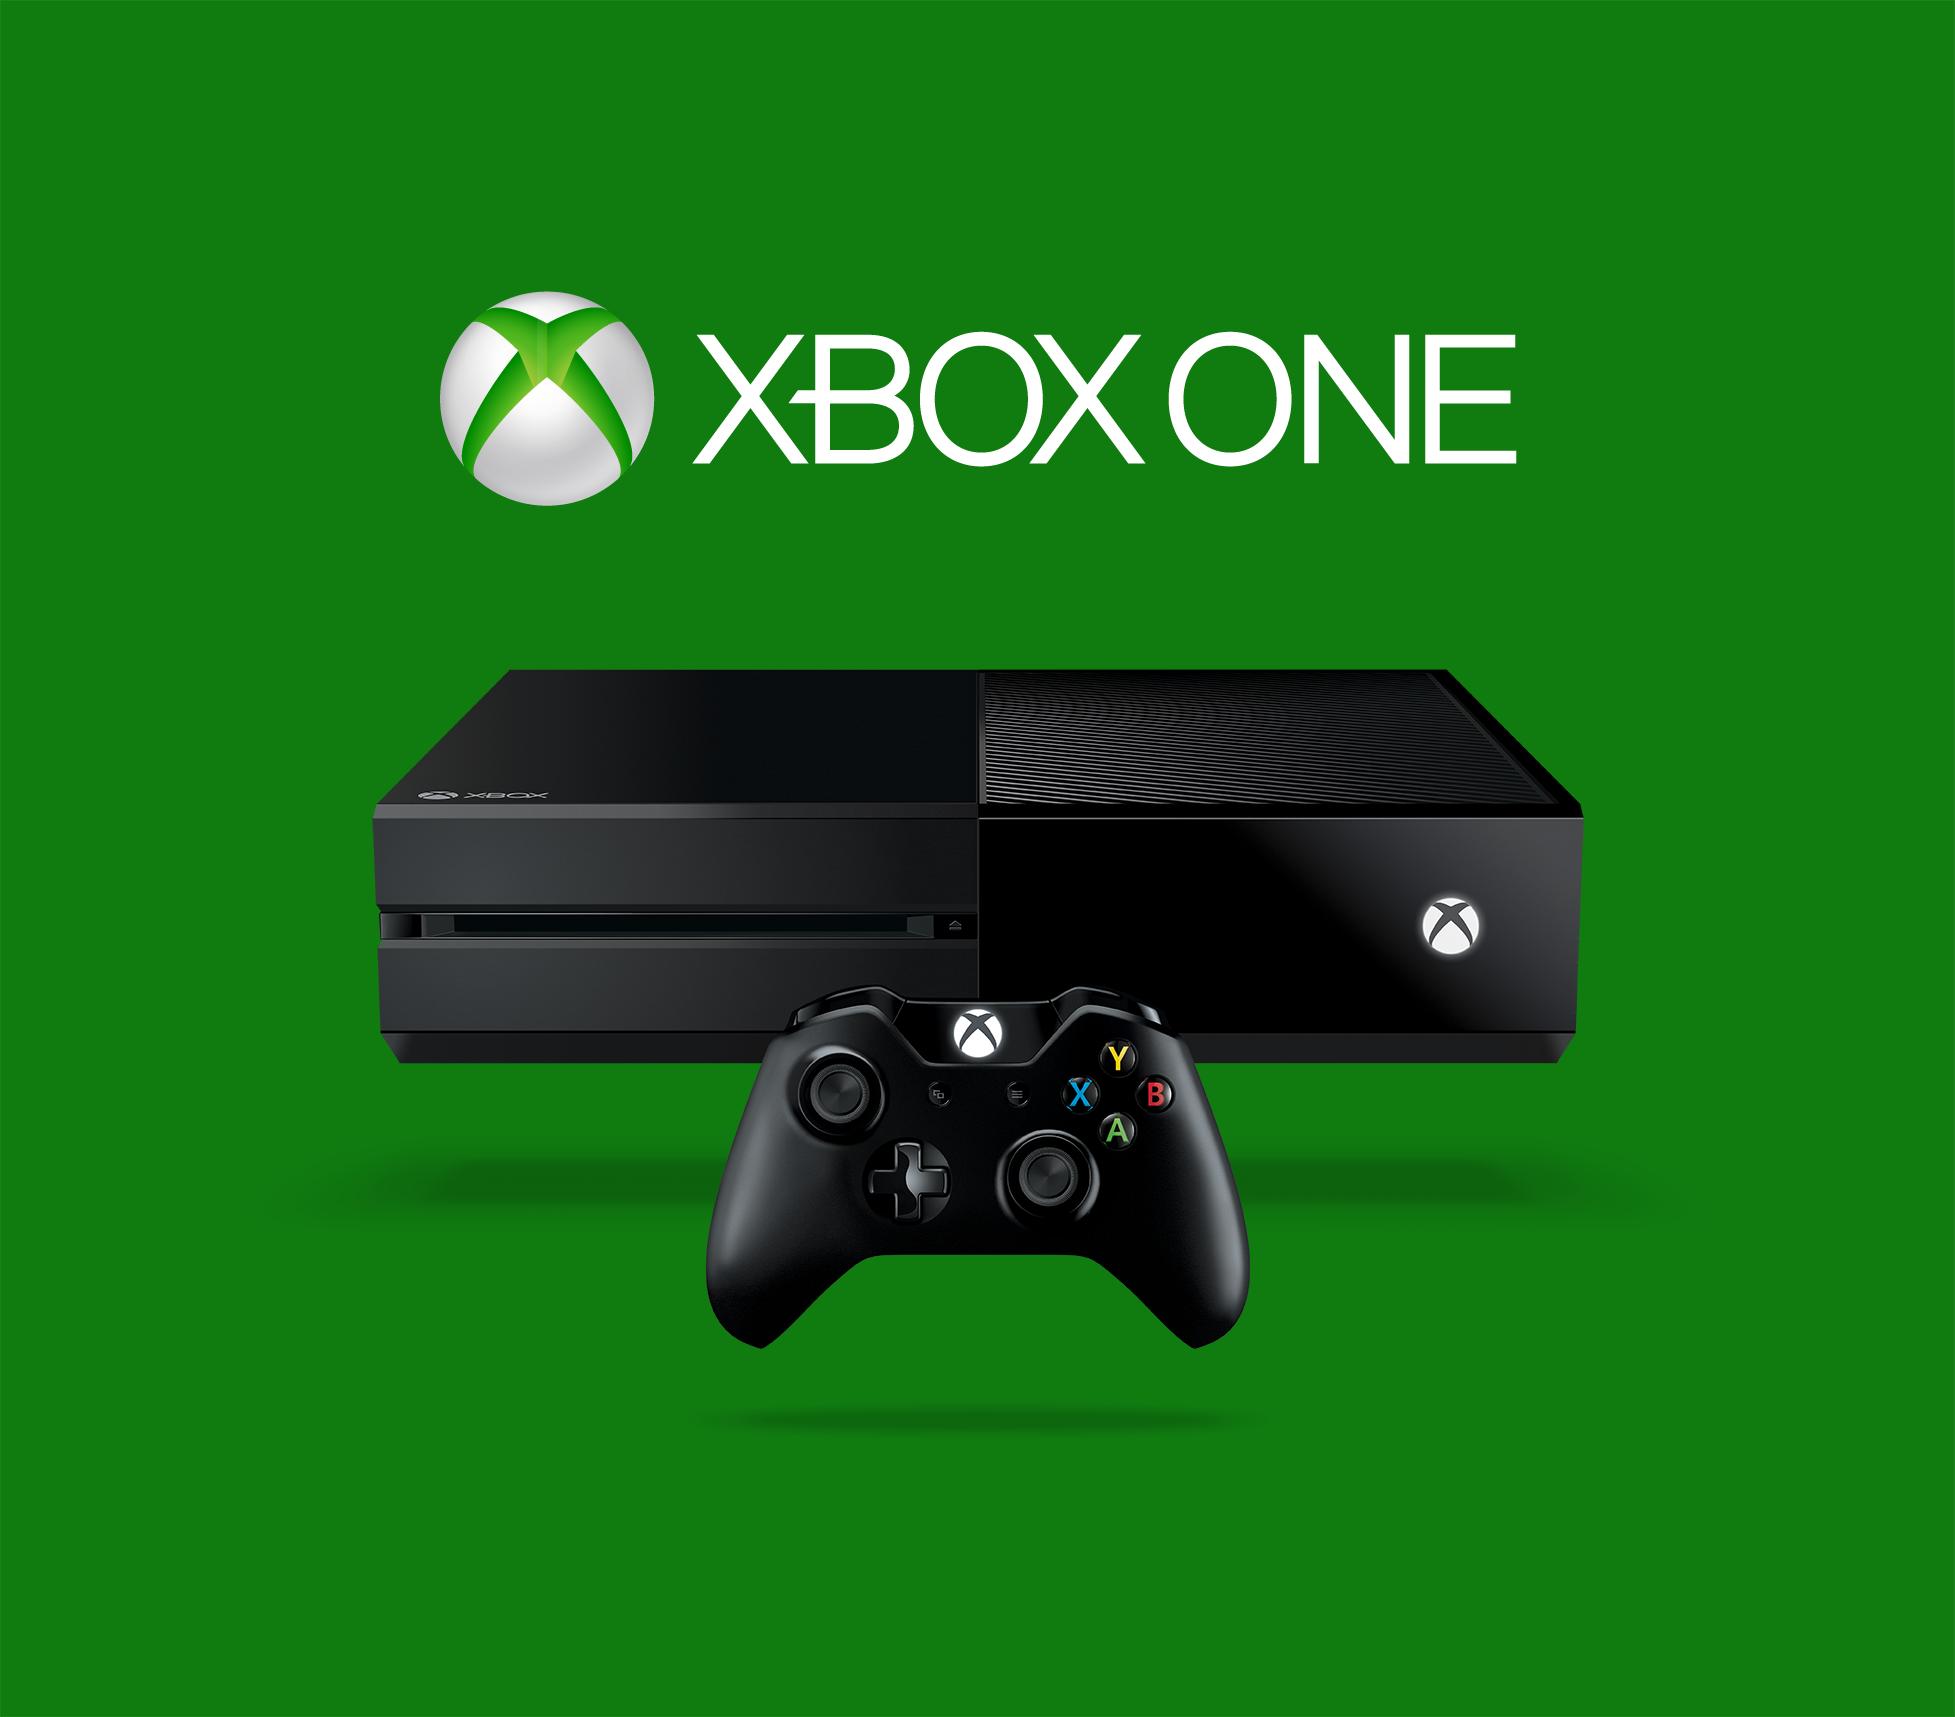 XboxOne_Iconic_Lockup_Console_Controller_2015_RGB